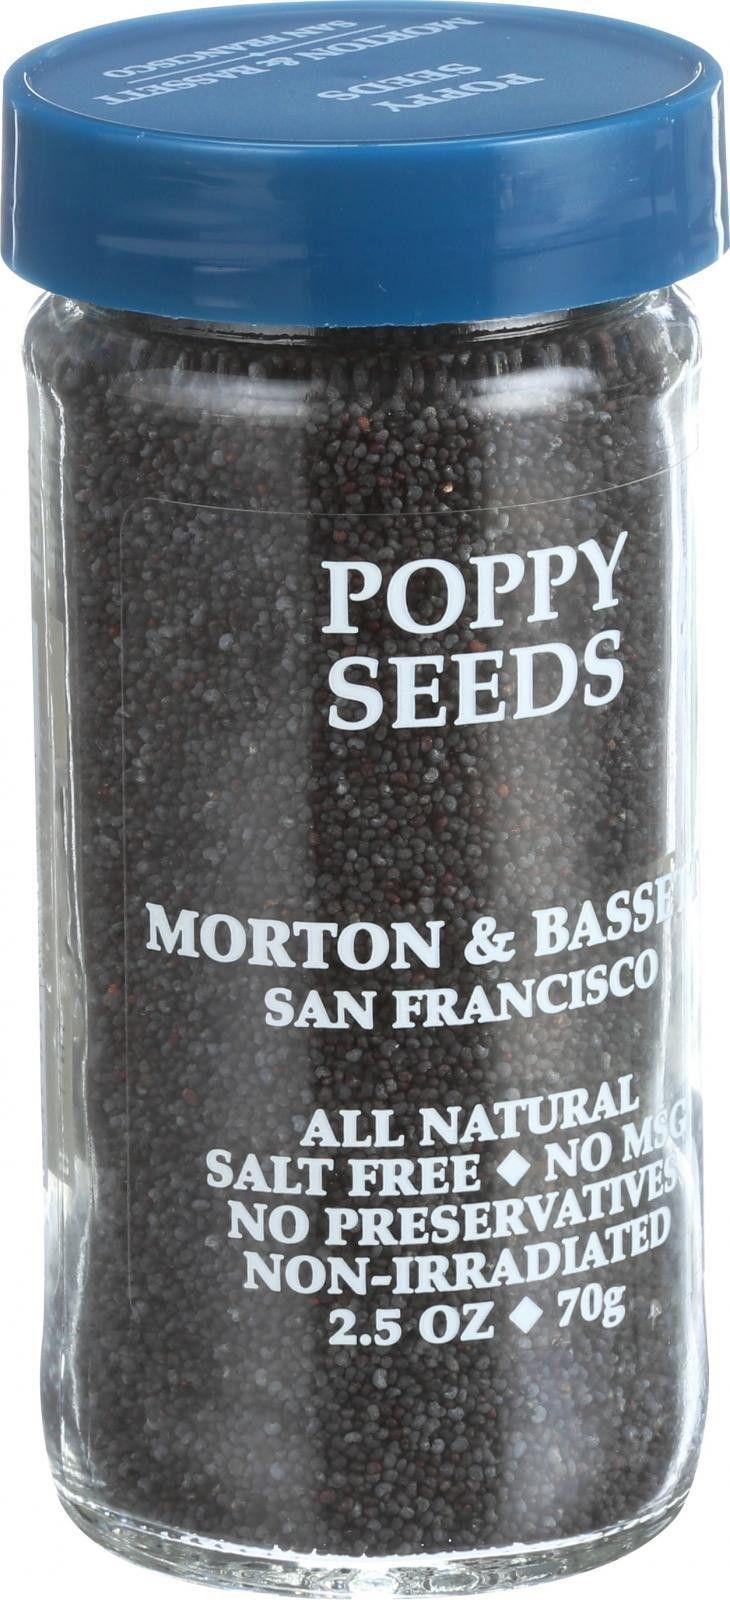 Morton And Bassett Seasoning - Poppy Seeds - 2.5 Oz - Case Of 3